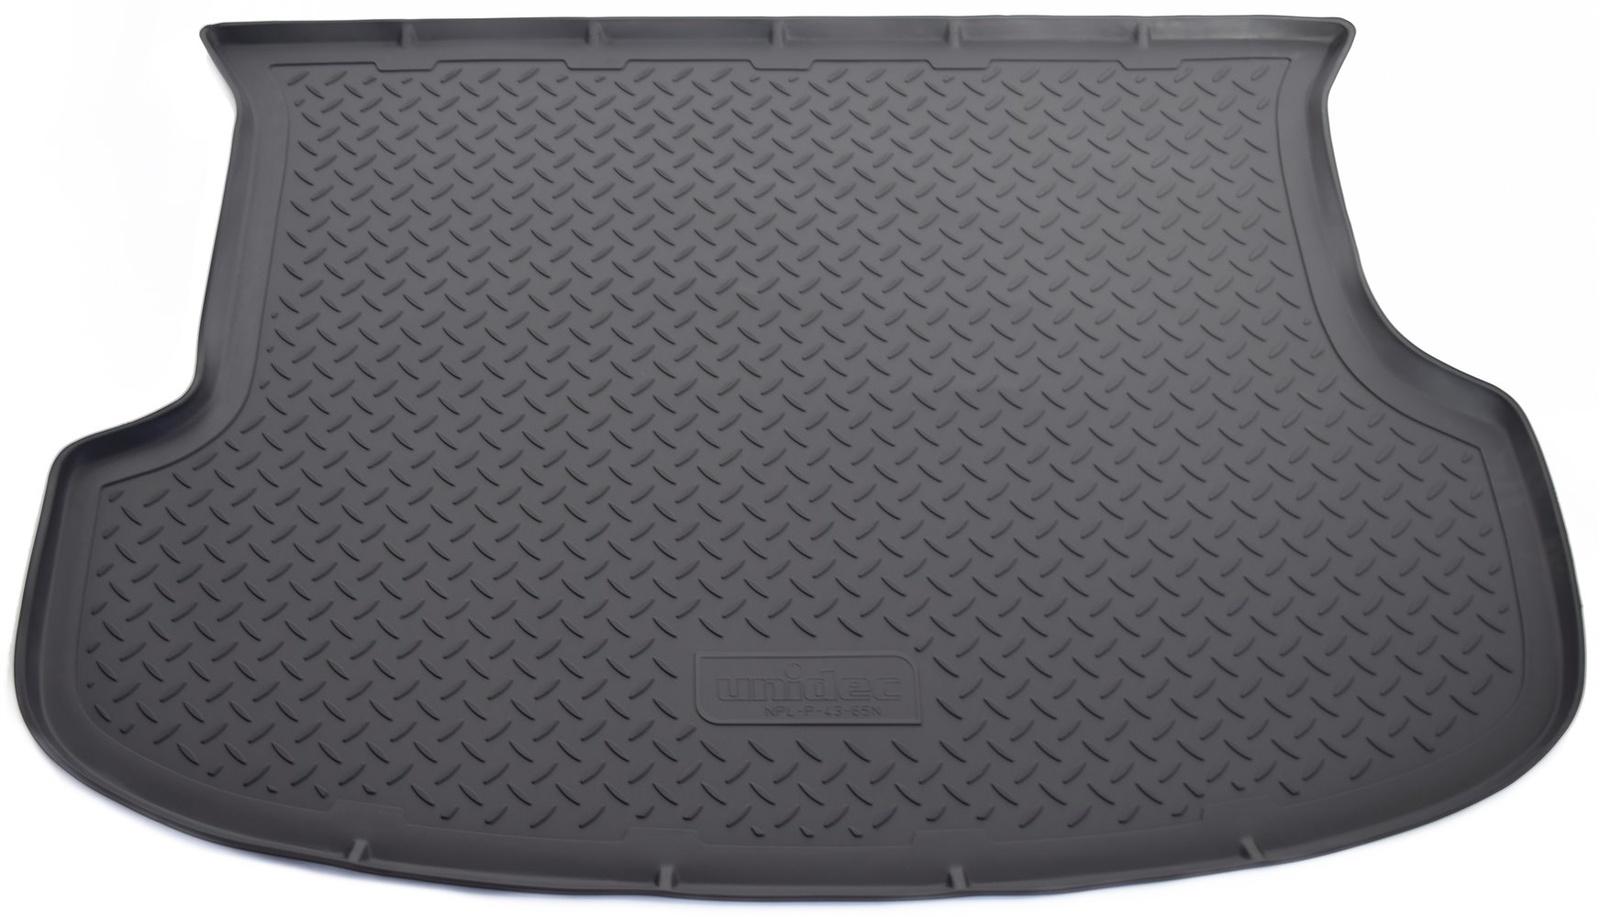 Коврик багажника Norplast для Kia Sorento XM 2009-2012, NPL-P-43-65N, черный